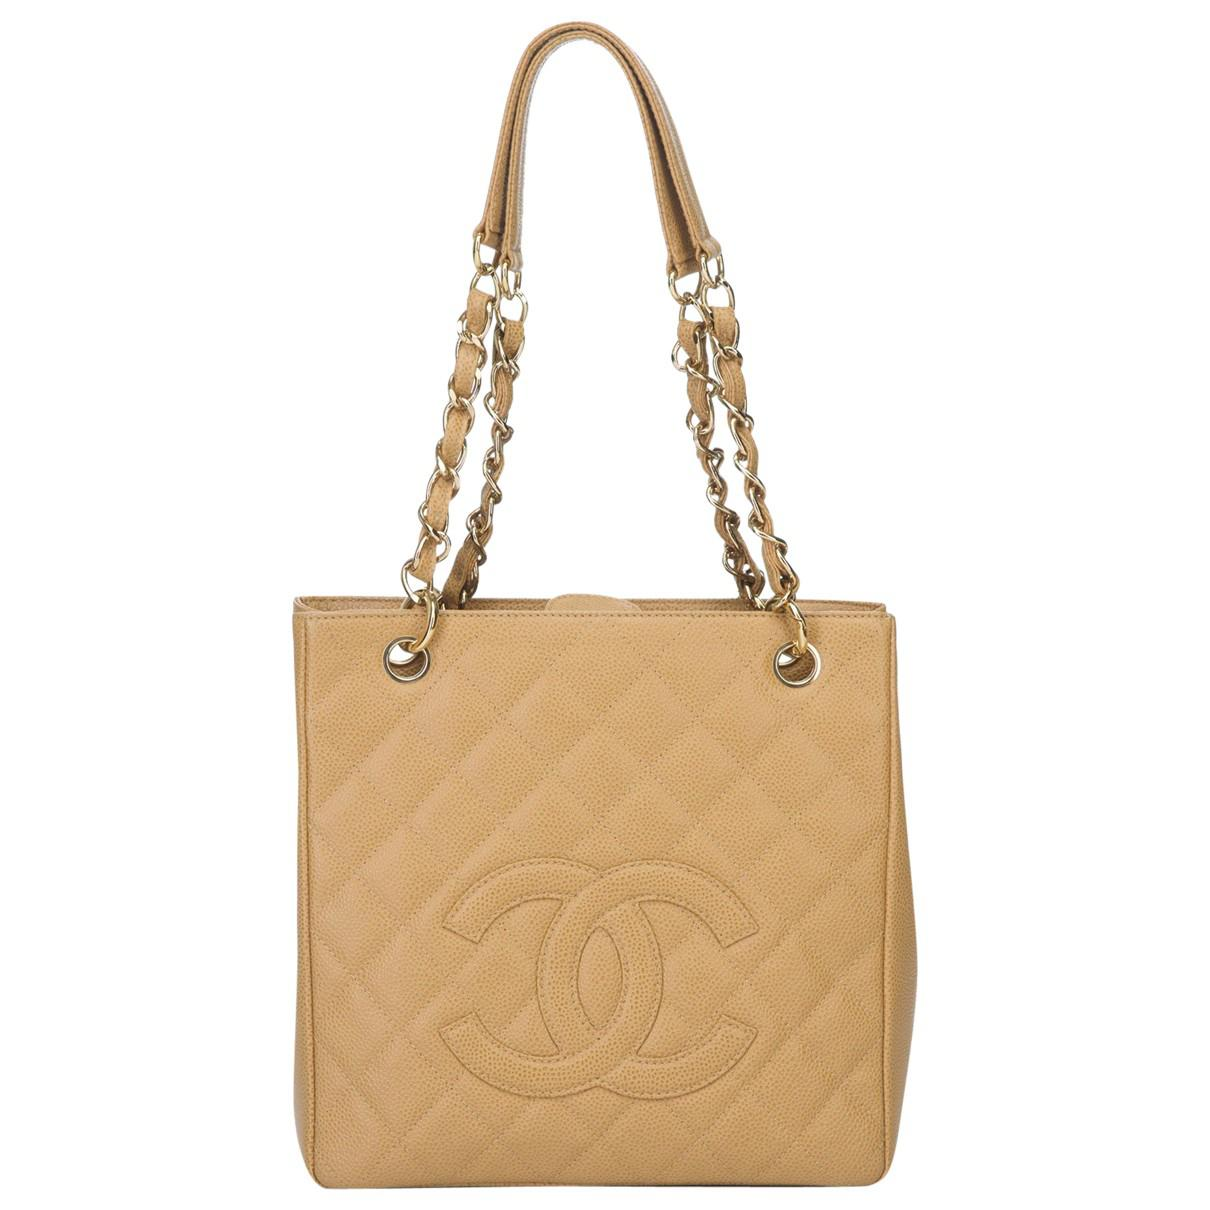 3e5c7decb73ae3 Lyst - Chanel Leather Tote